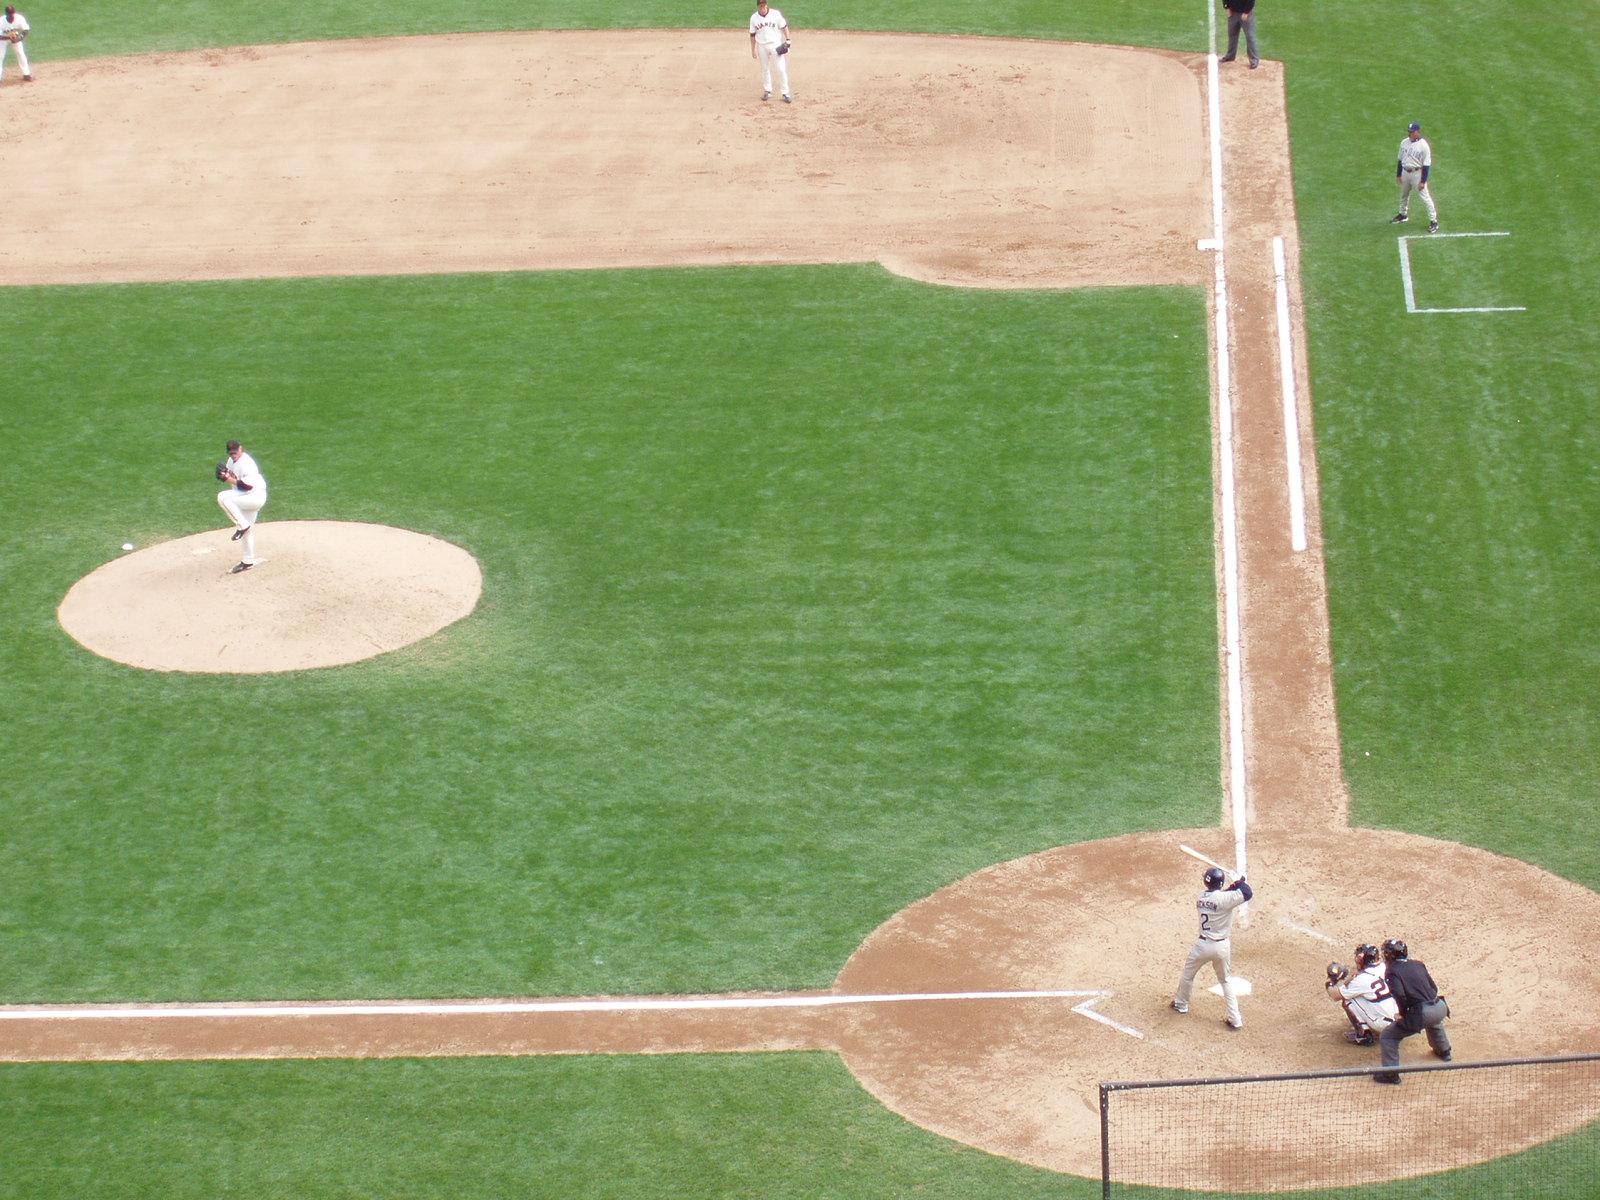 http://upload.wikimedia.org/wikipedia/commons/7/71/Typical_baseball_game.JPG